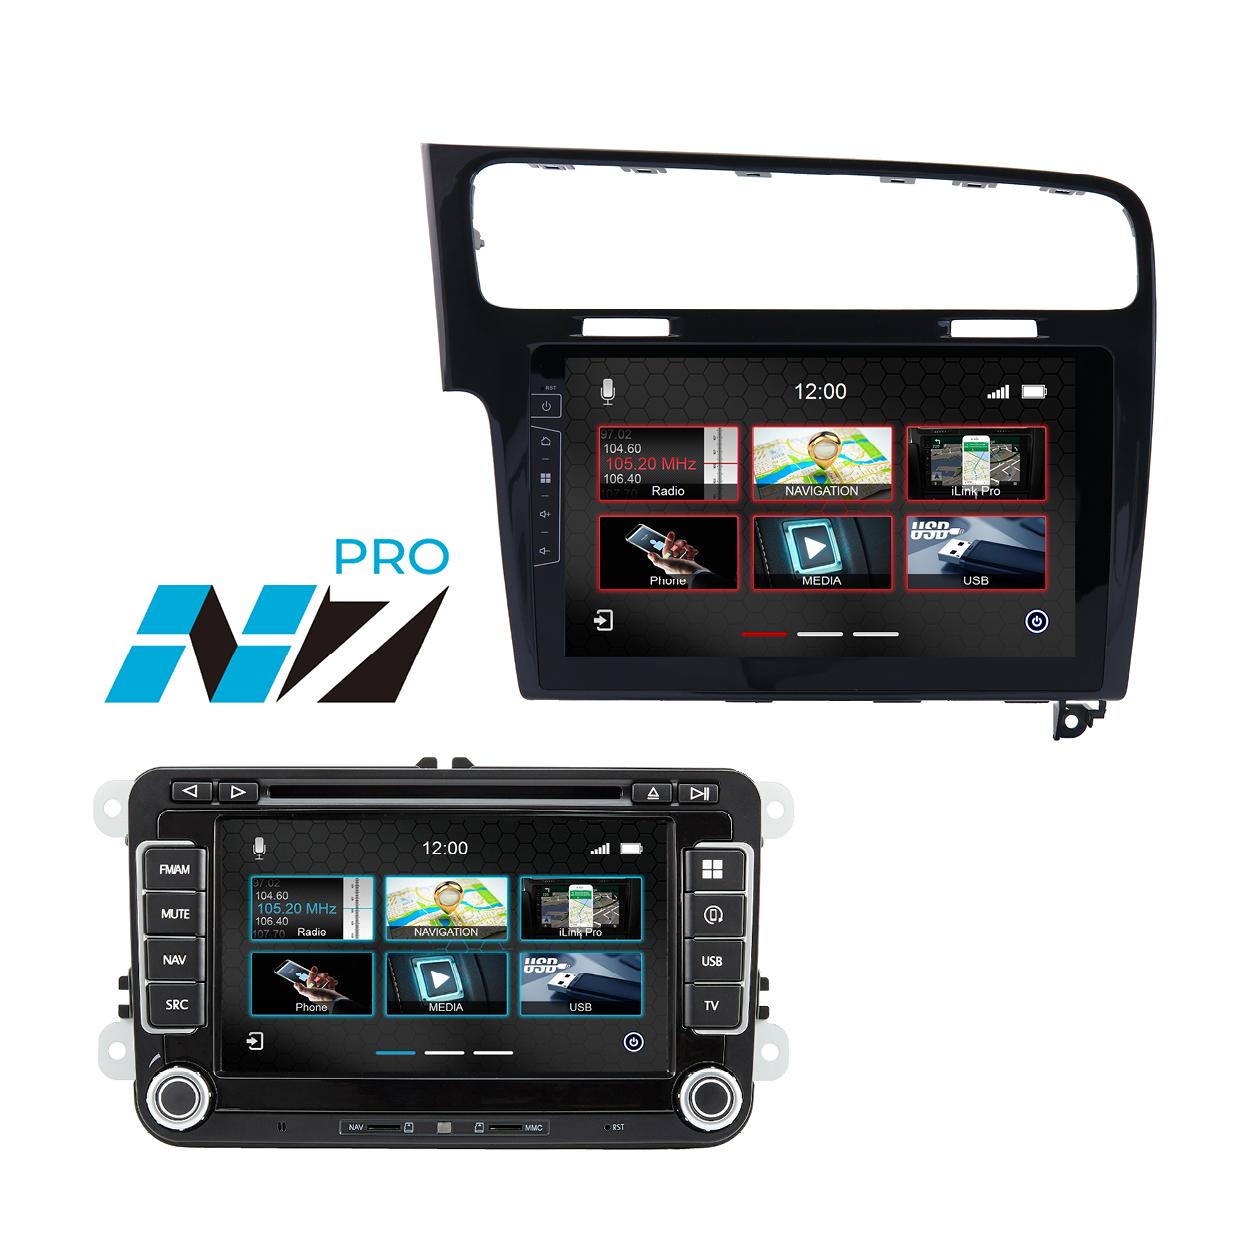 Navigationsgeräte für Car-Hifi